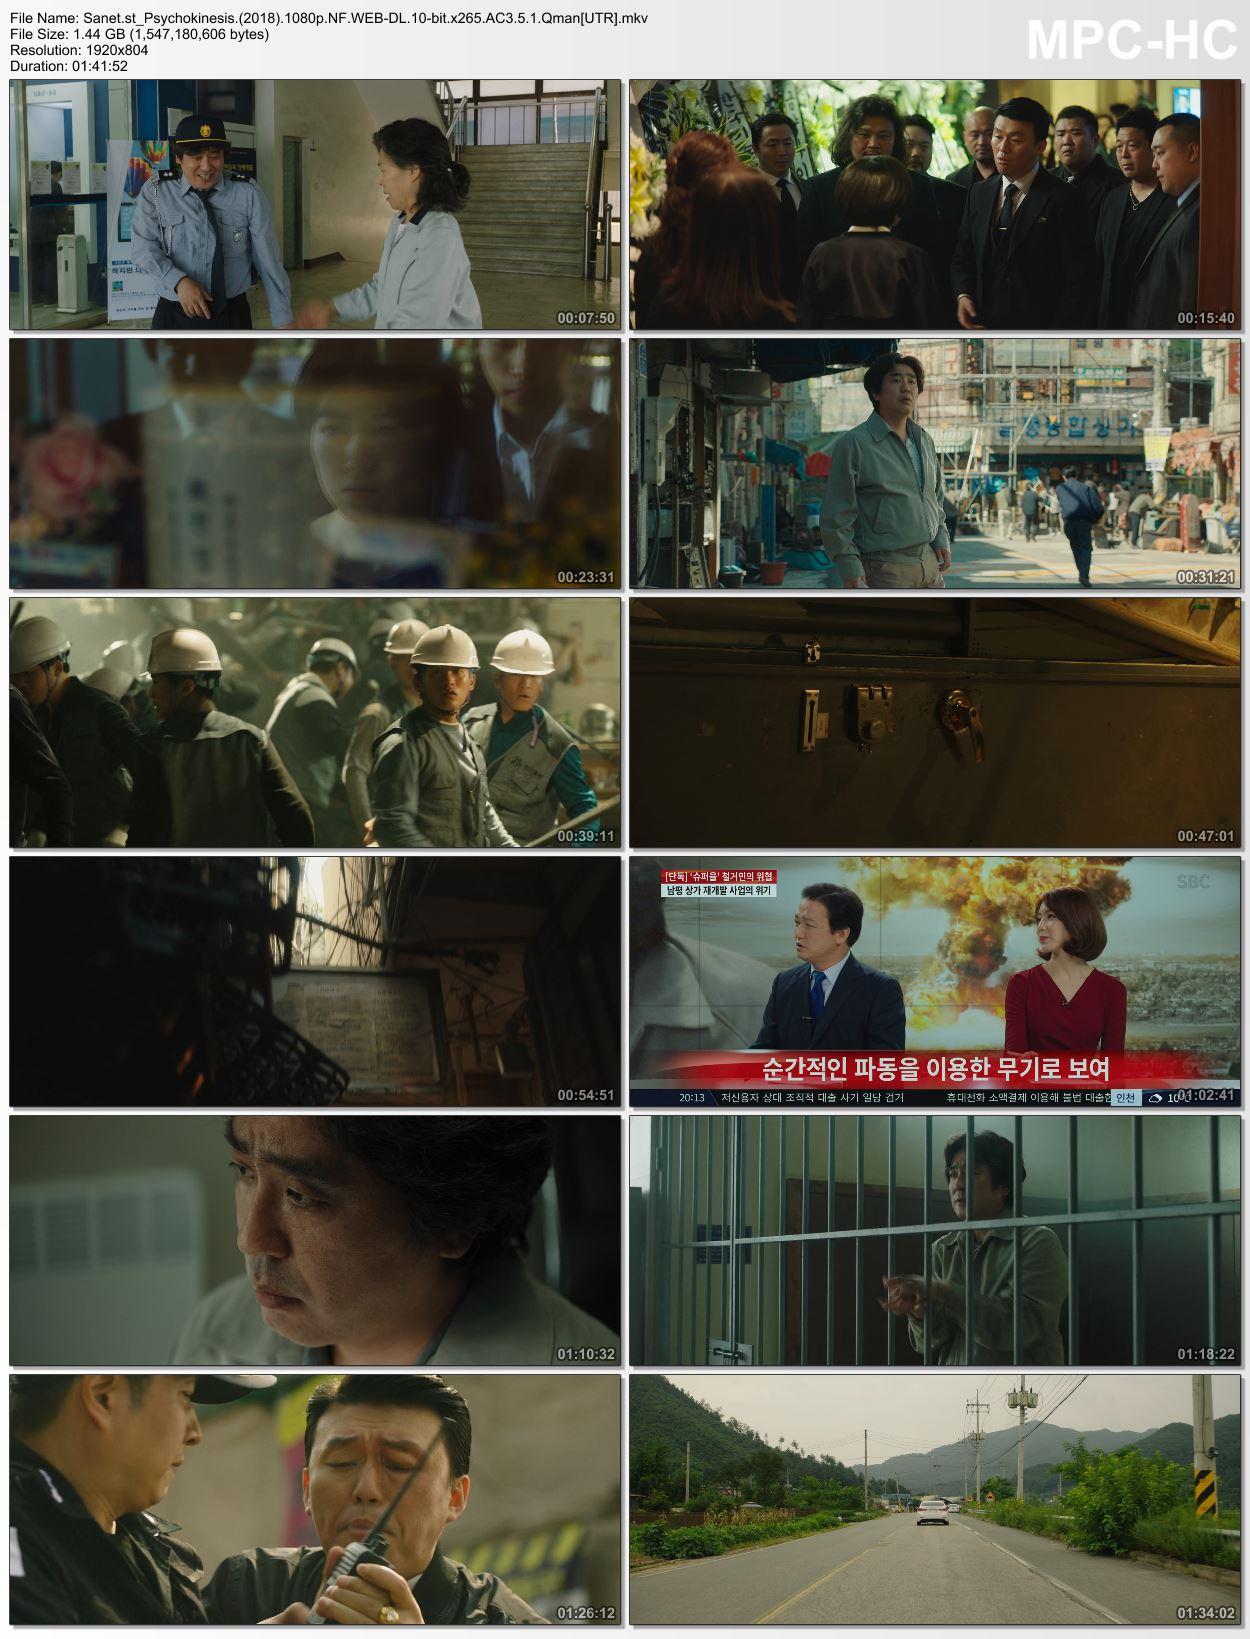 Psychokinesis 2018 2 دانلود فیلم دیدنی و جذاب اقتدار و قدرت ذهنی با دوبله فارسی